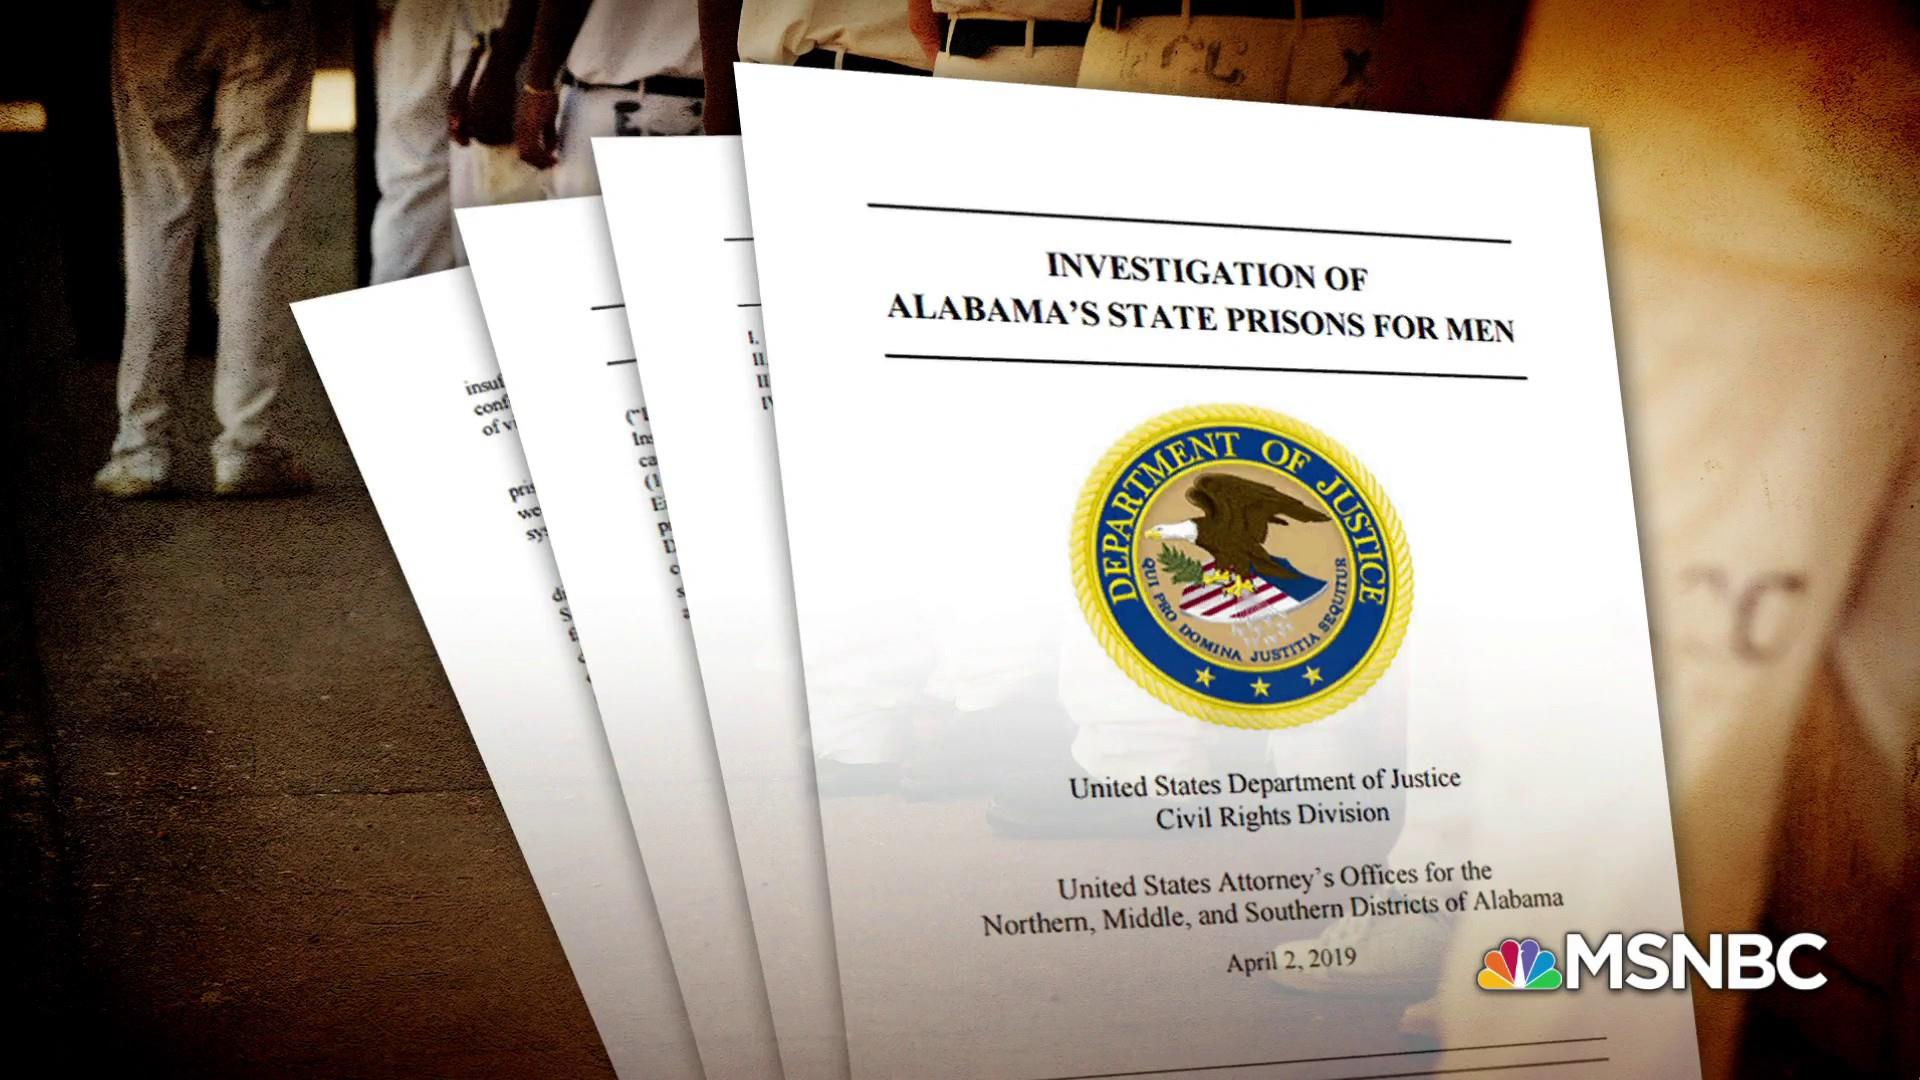 DOJ report: rampant inmate abuse in Alabama prisons